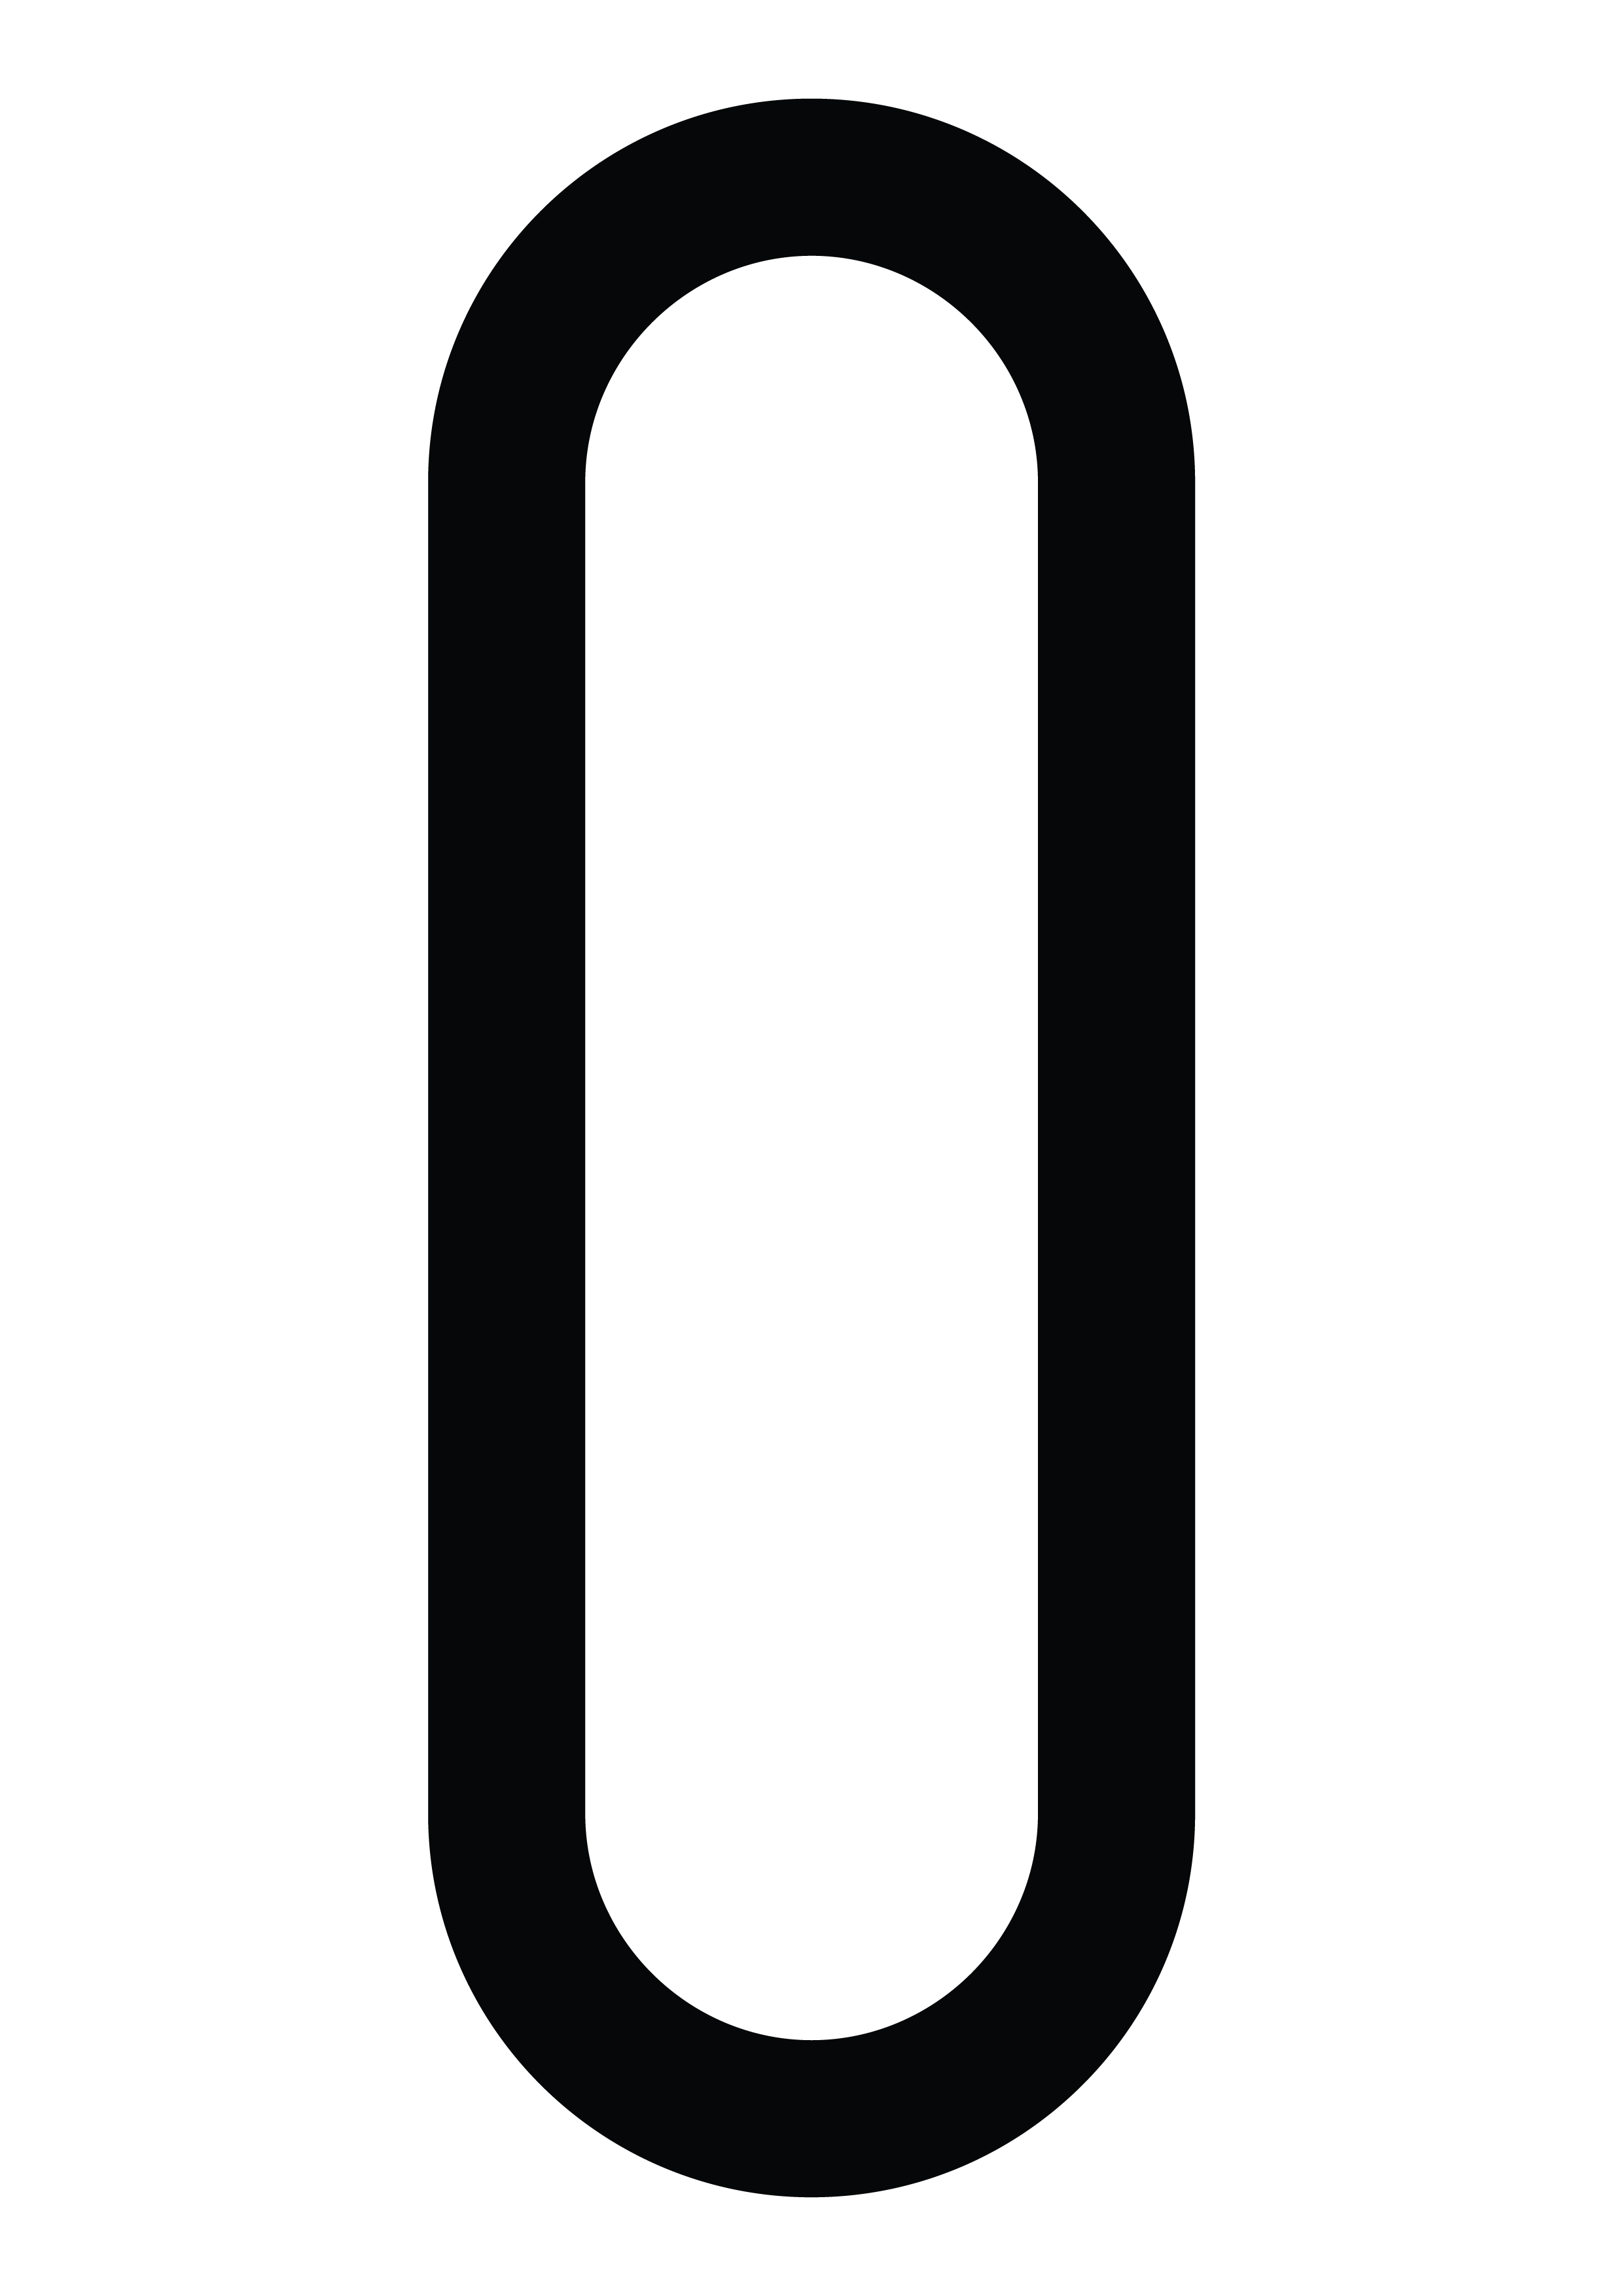 BINARY CODE-01.png